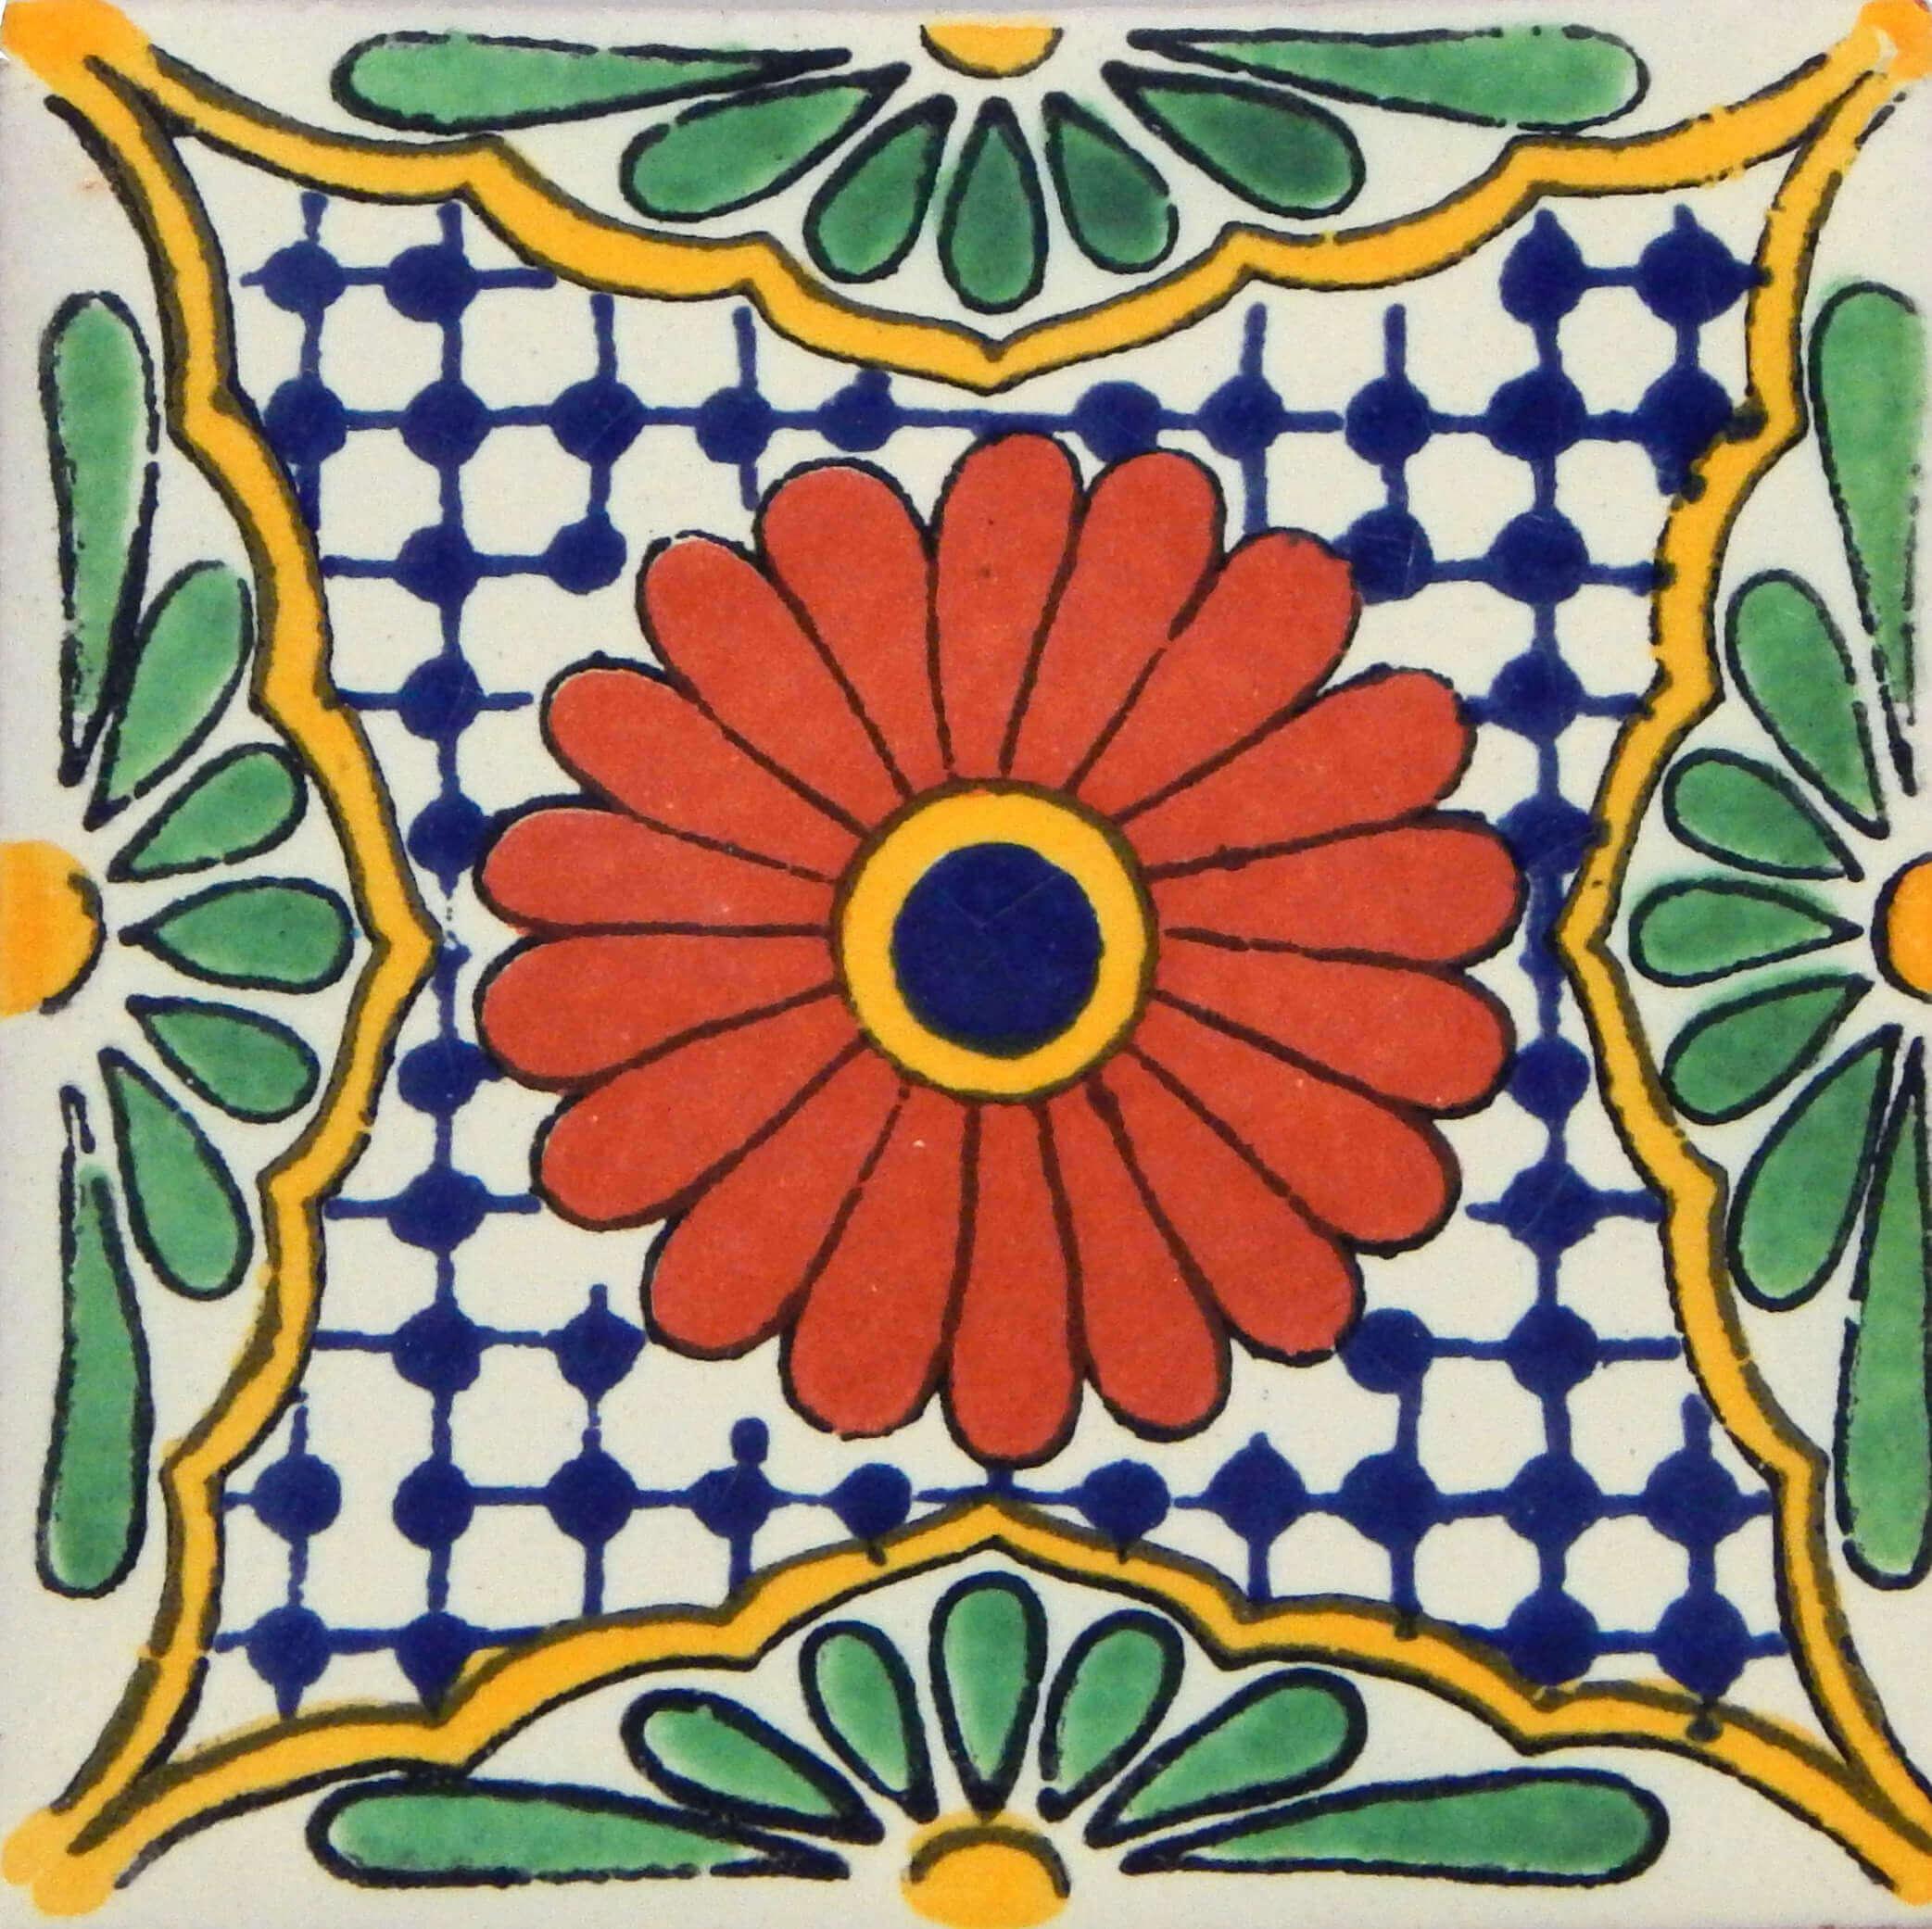 Flor de Pascua Mexican Decorative Folk Art Tile